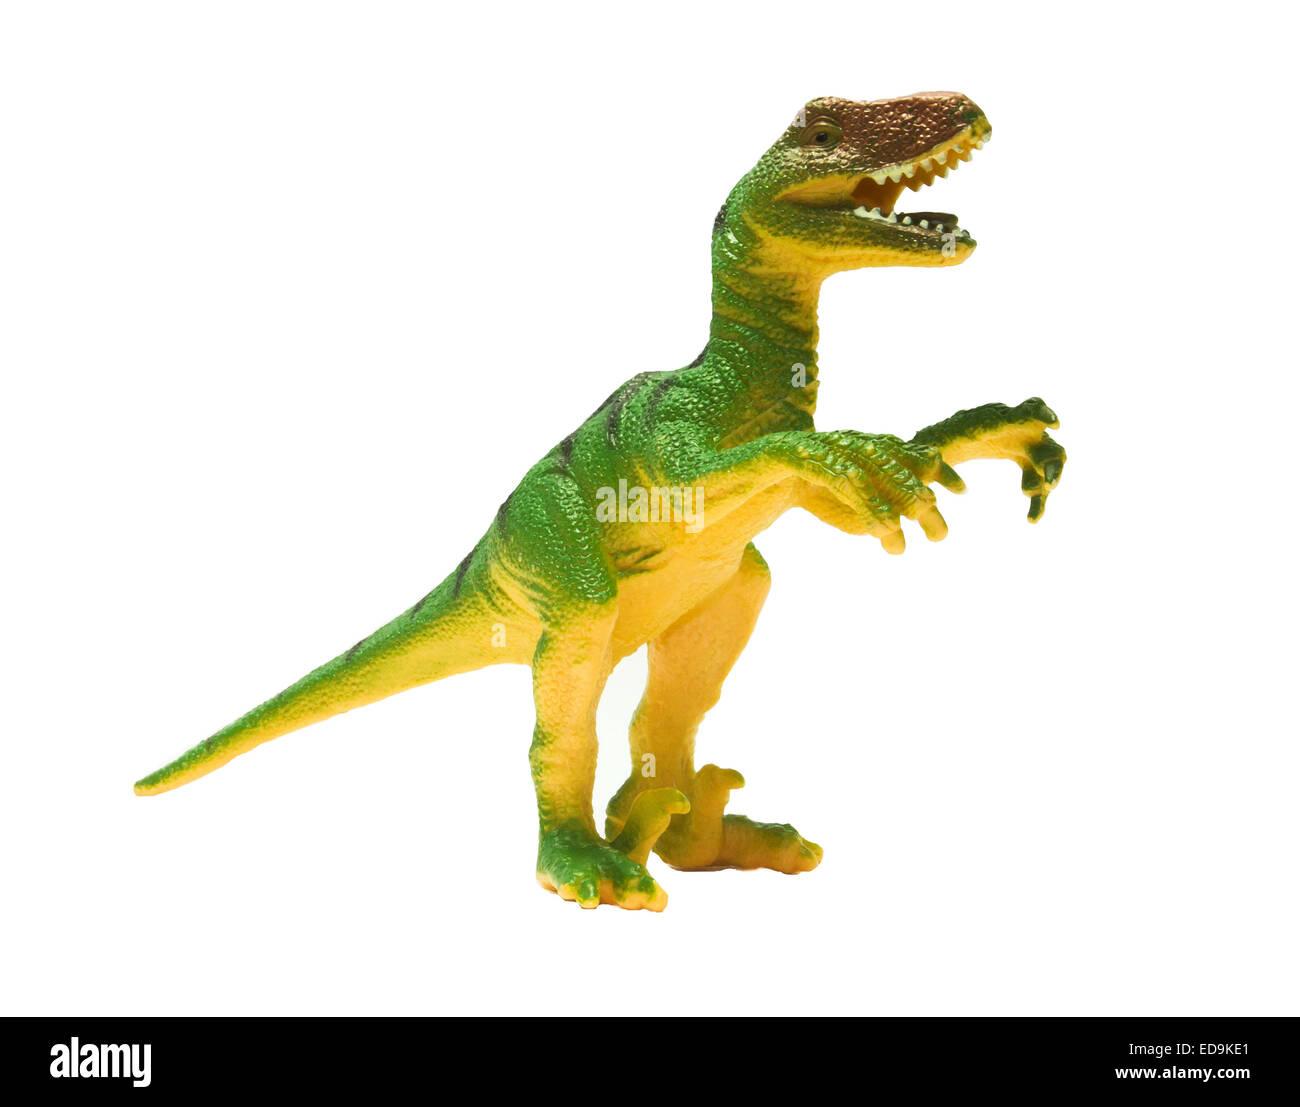 Toy dinosaur isolated on a white background - Stock Image